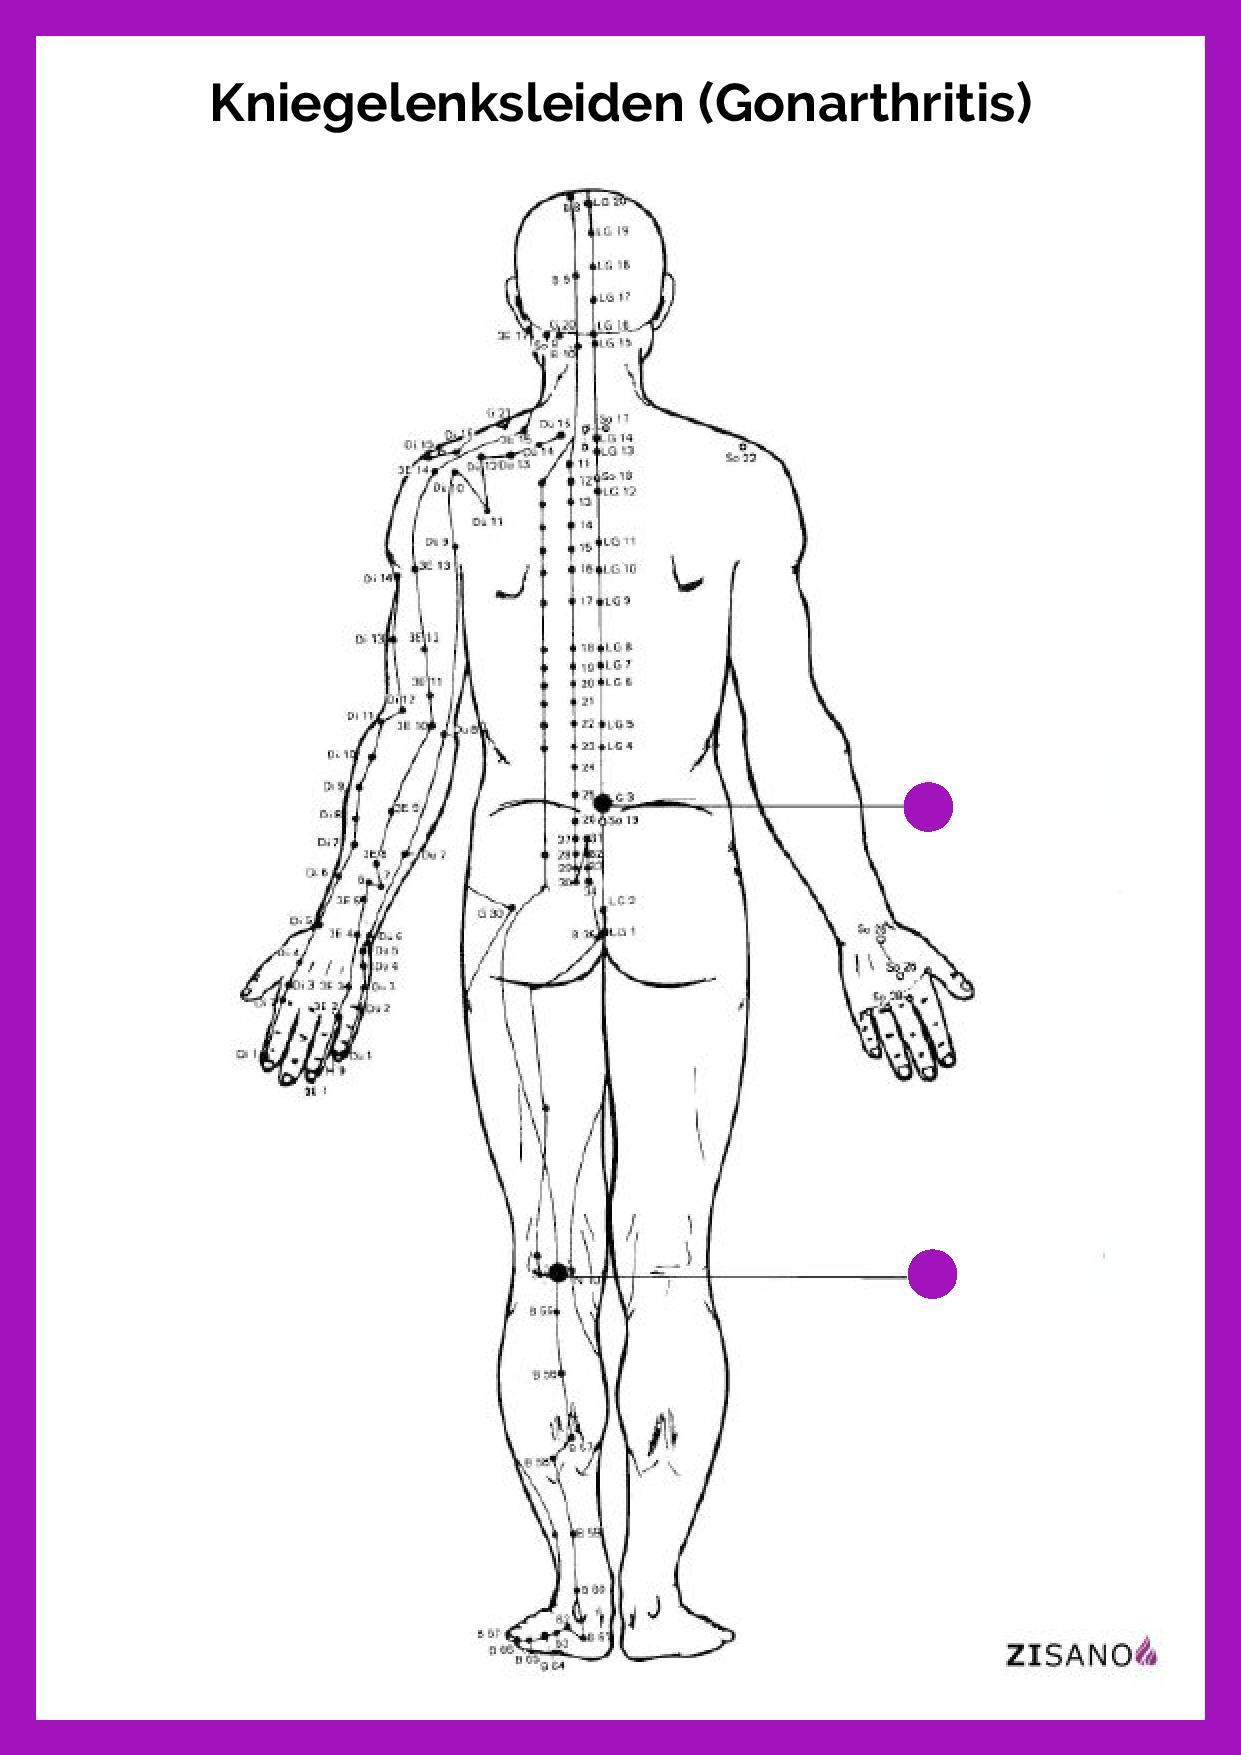 Meridiane - Kniegelenksleiden - Gonarthritis - Beschwerden